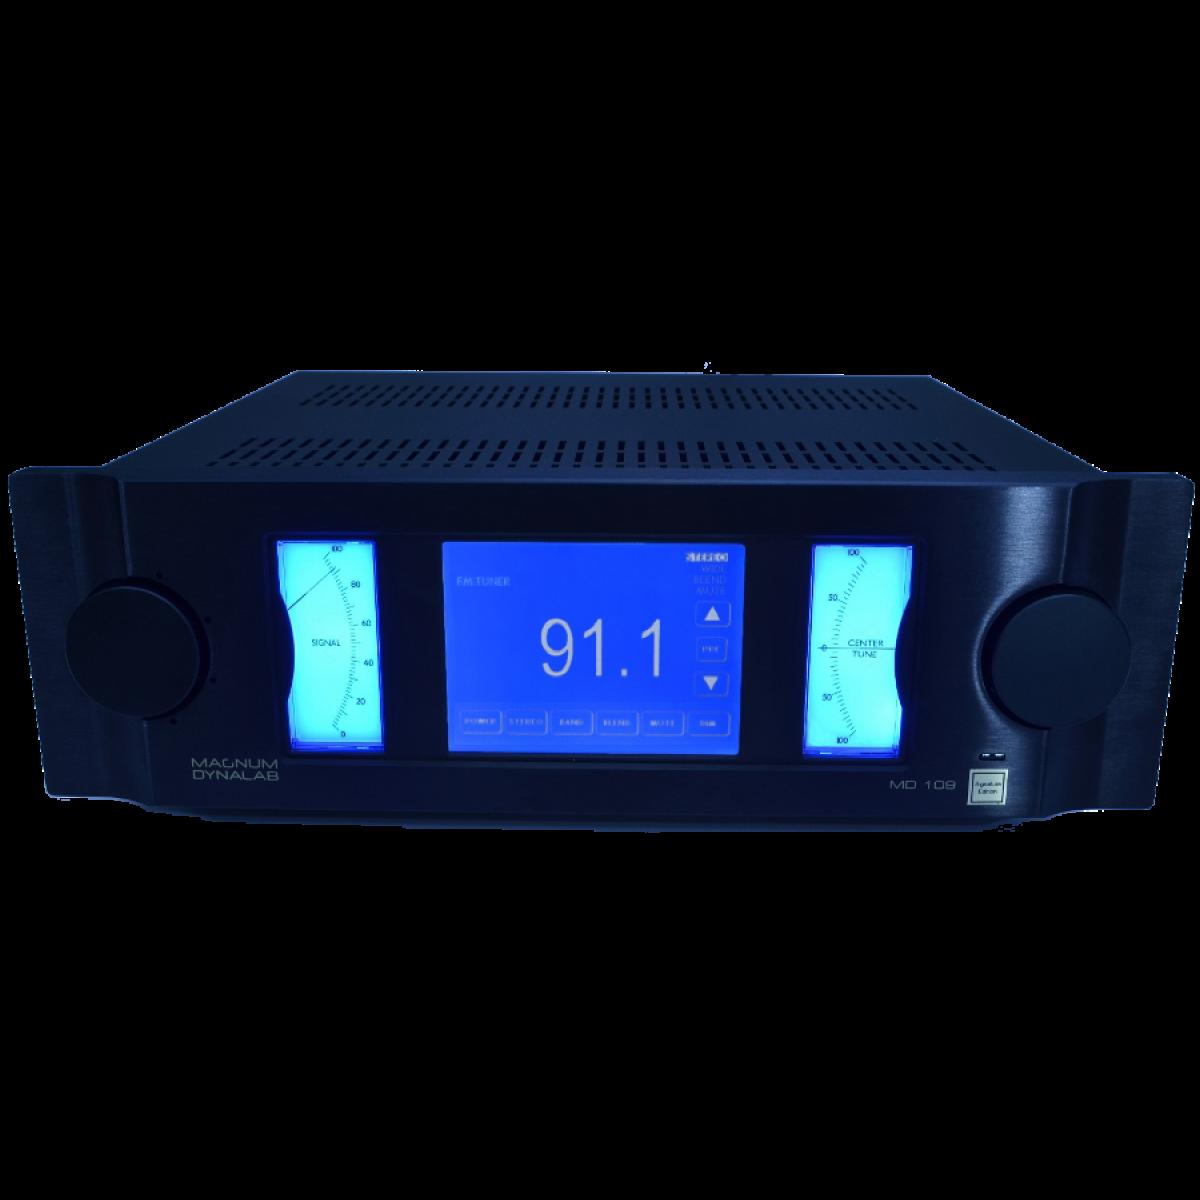 Magnum Dynalab MD 109 SE FM Tuner